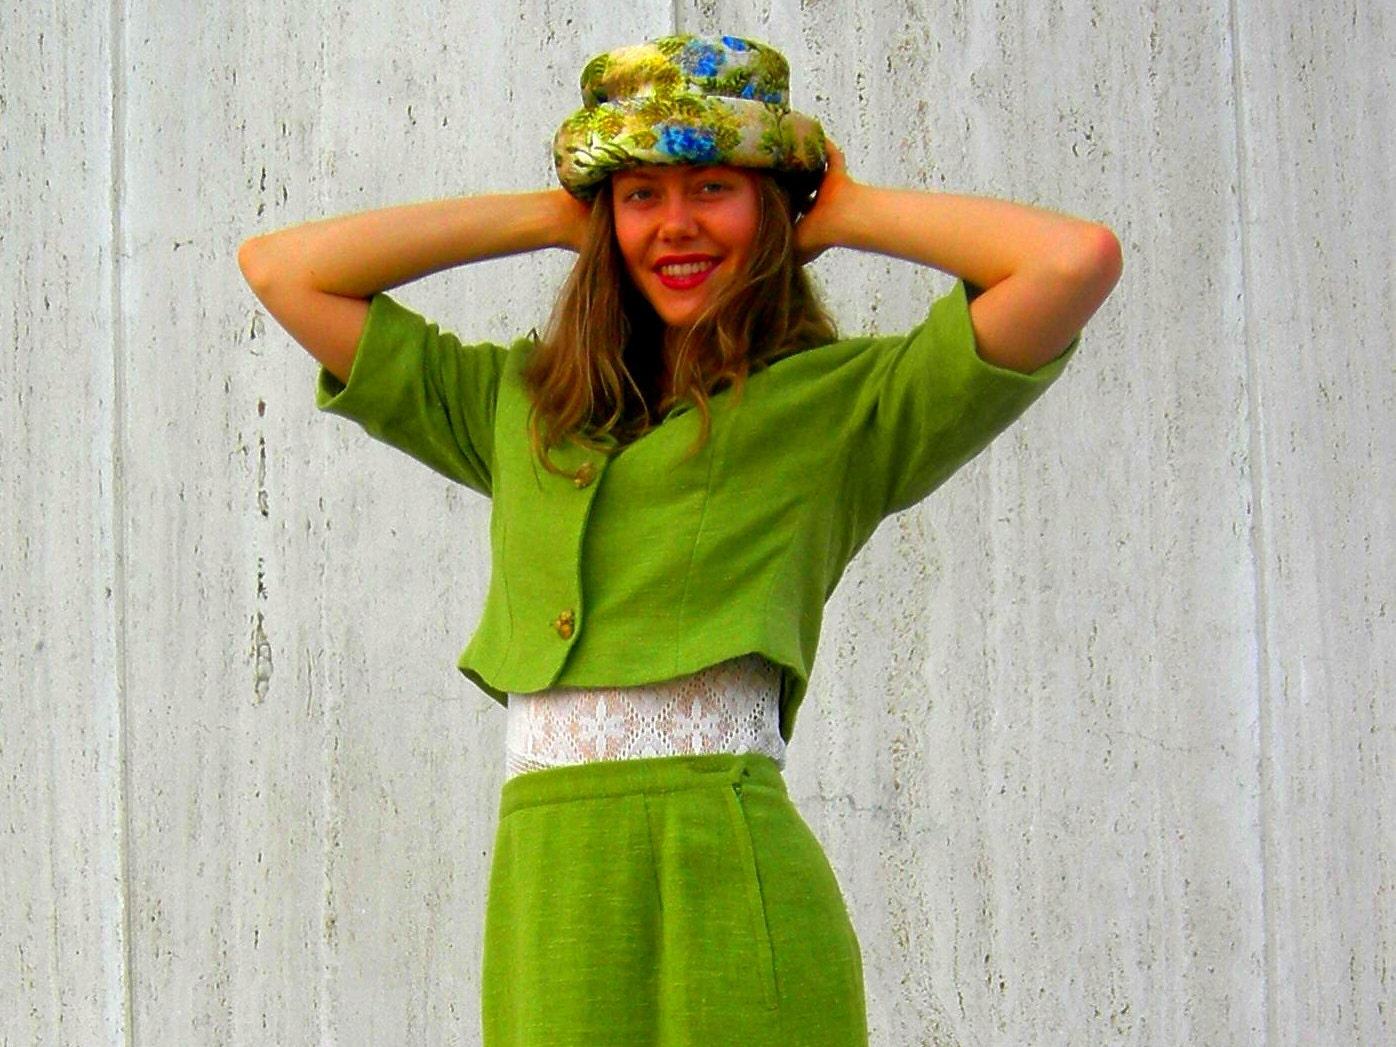 Vintage 1960s green dress suit jackie o'nassis mod - SassySenoritaVintage